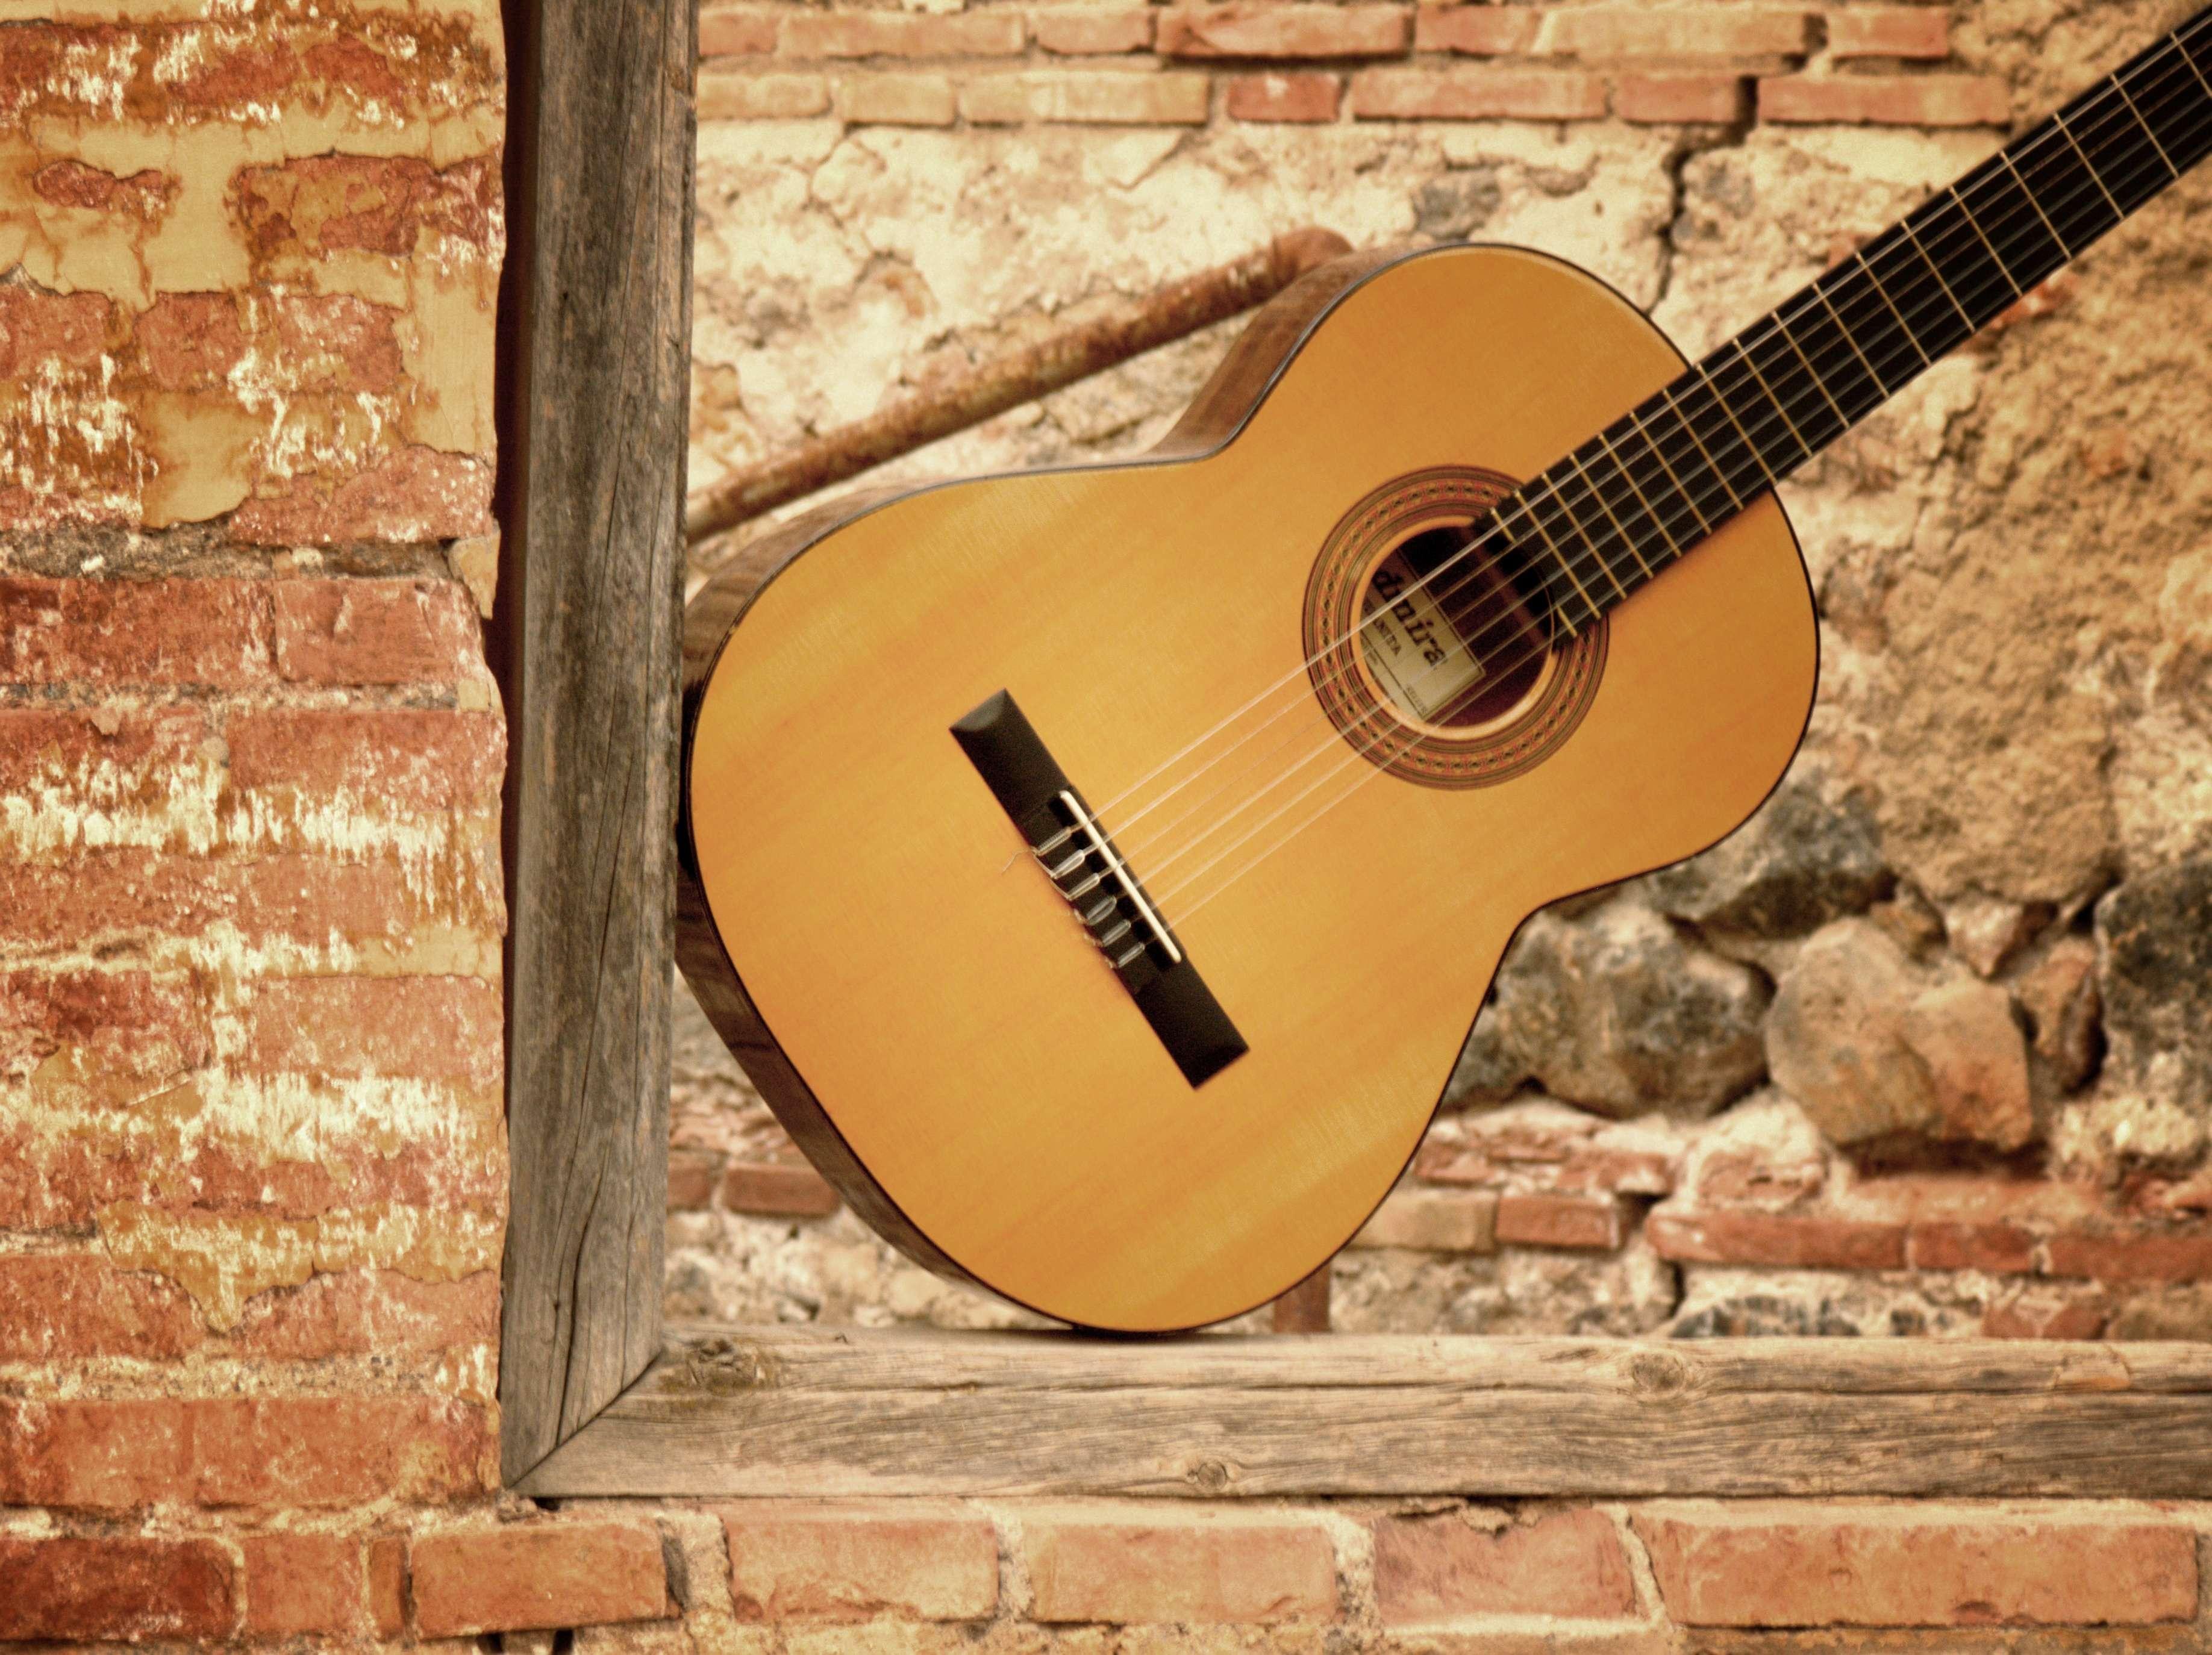 Guitarras Manzanero